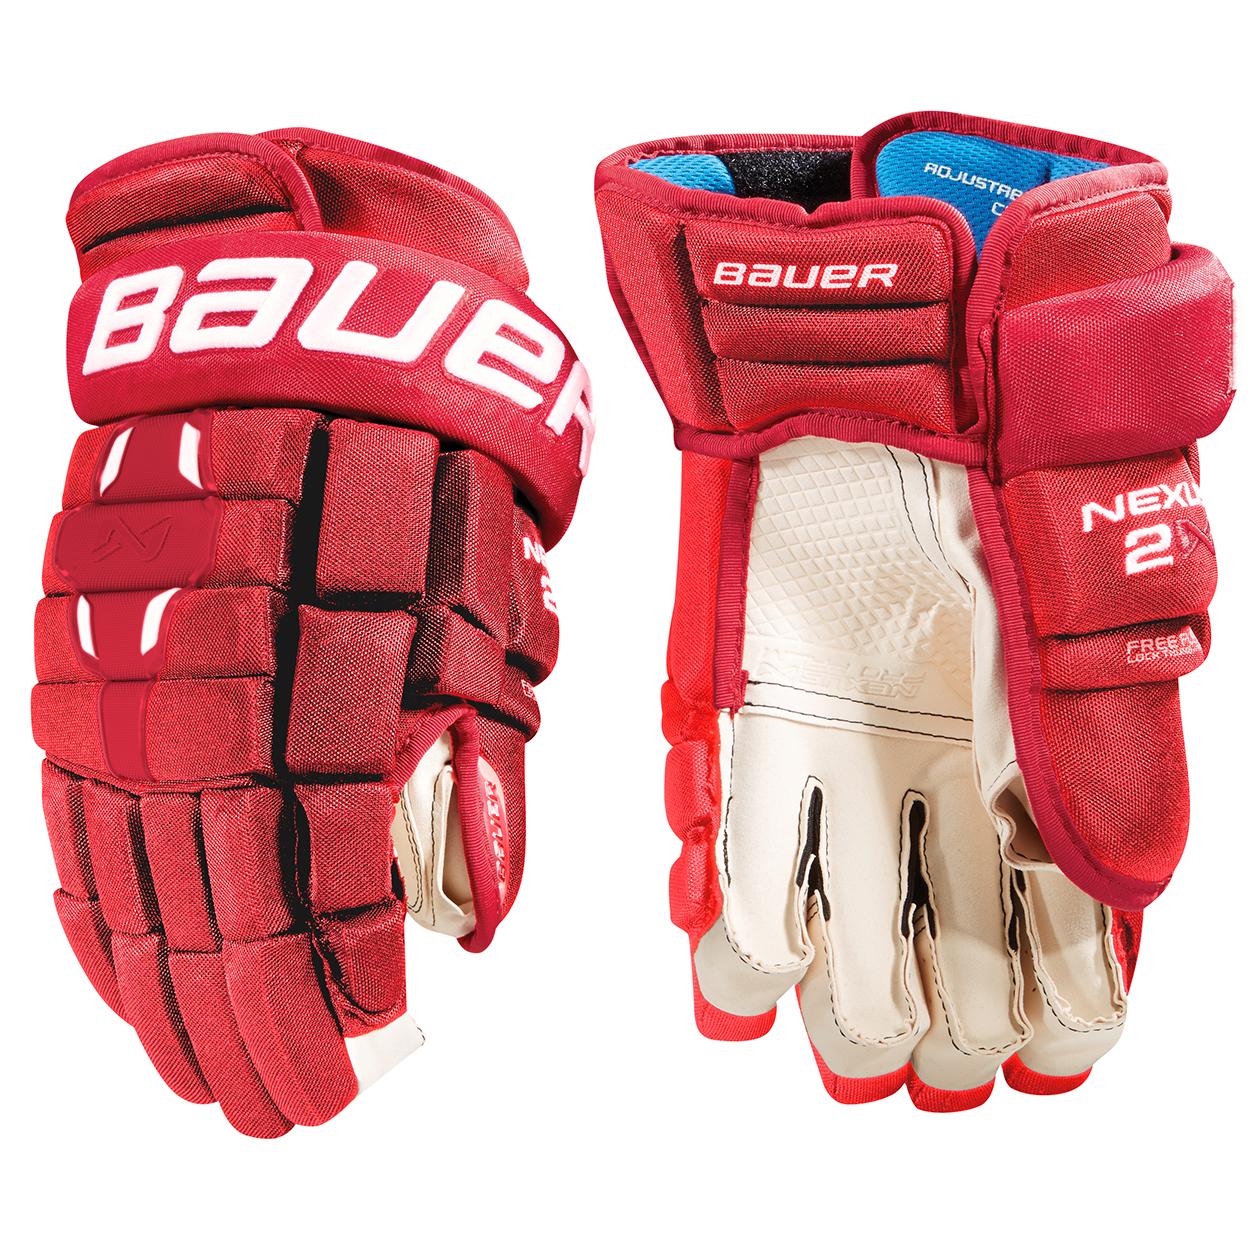 NEXUS 2N Glove - Senior